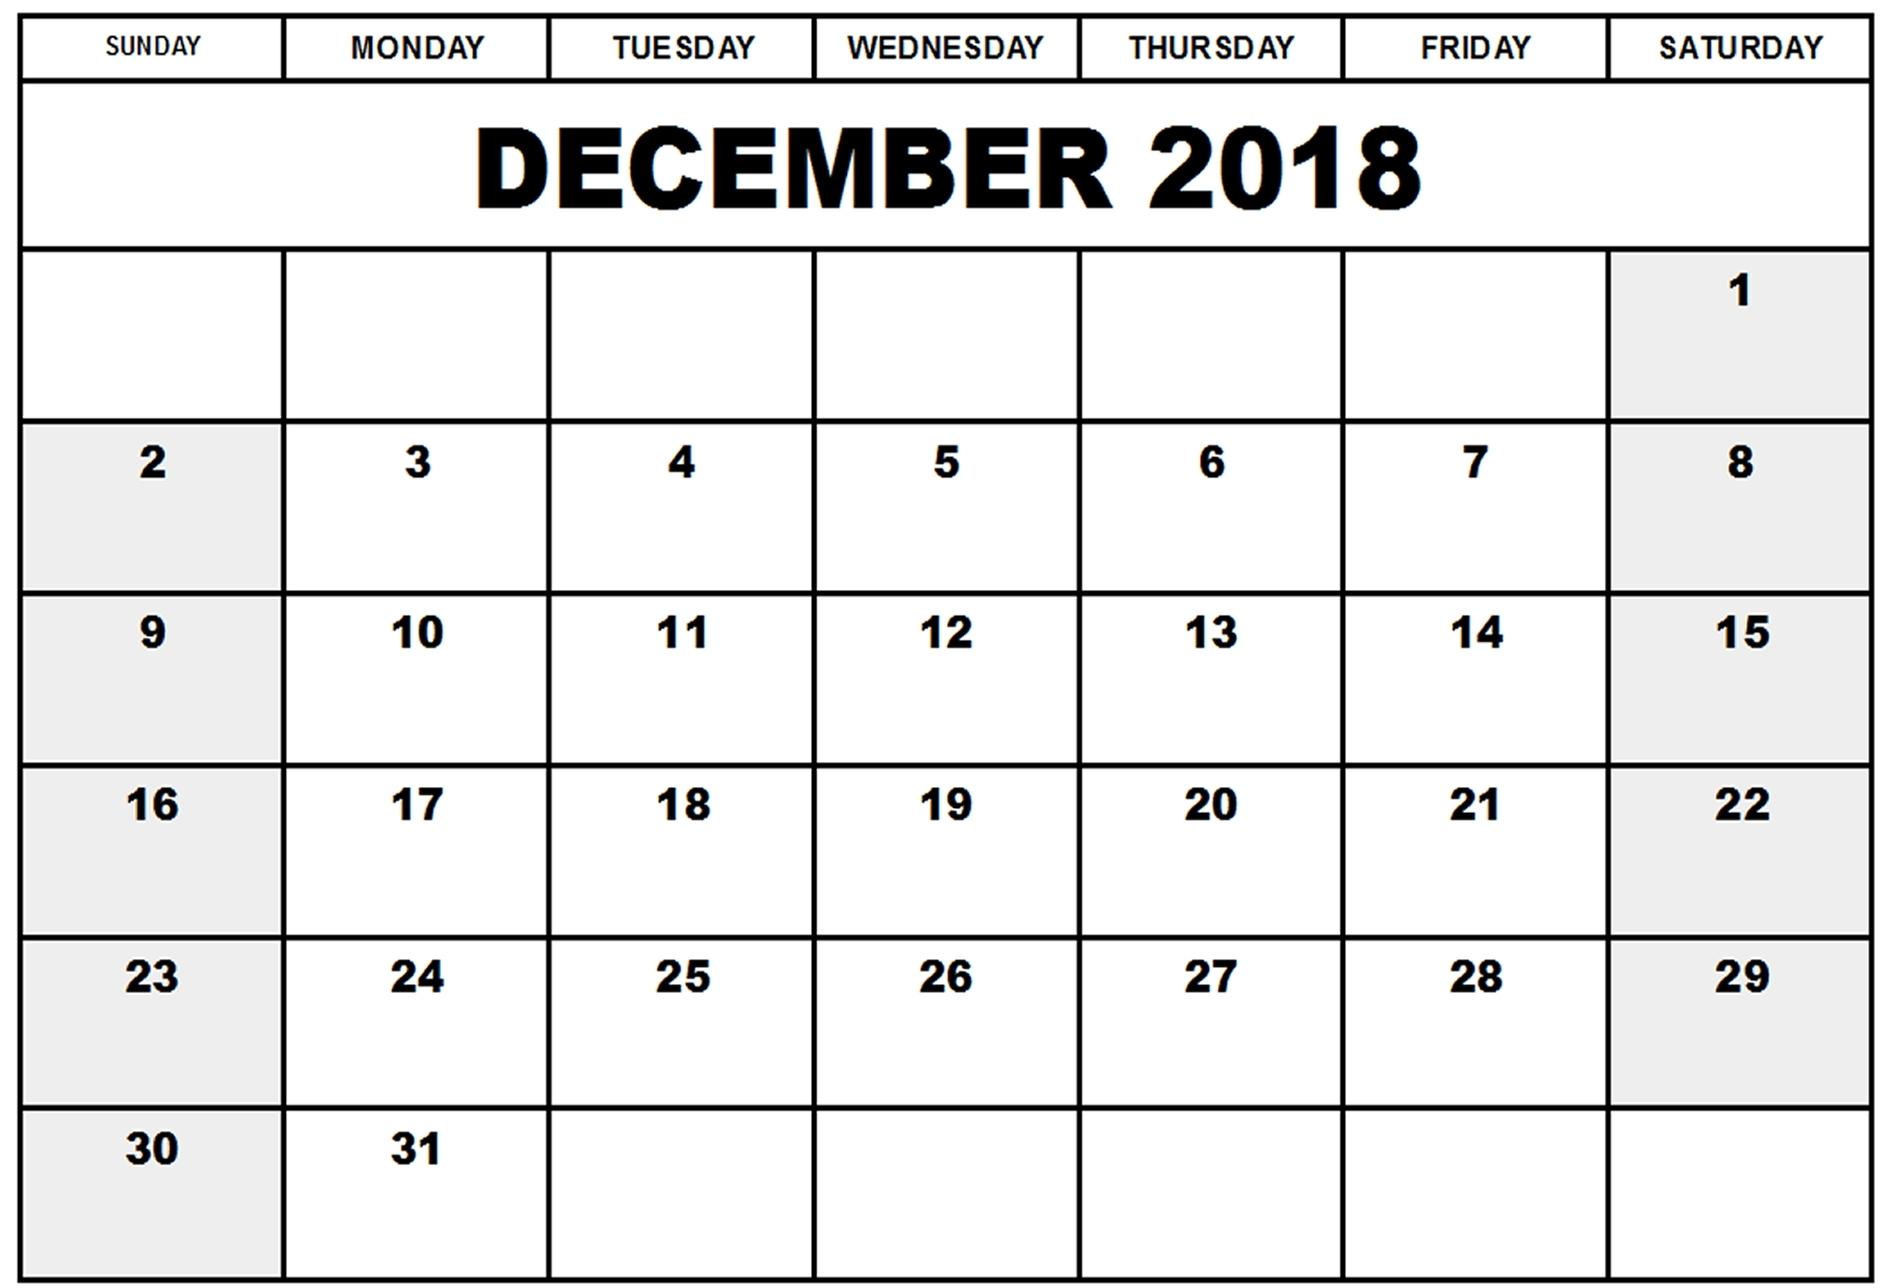 2018 Blank December Calendar Template Download | Free Printable with regard to Blank Calendar Printable December Template